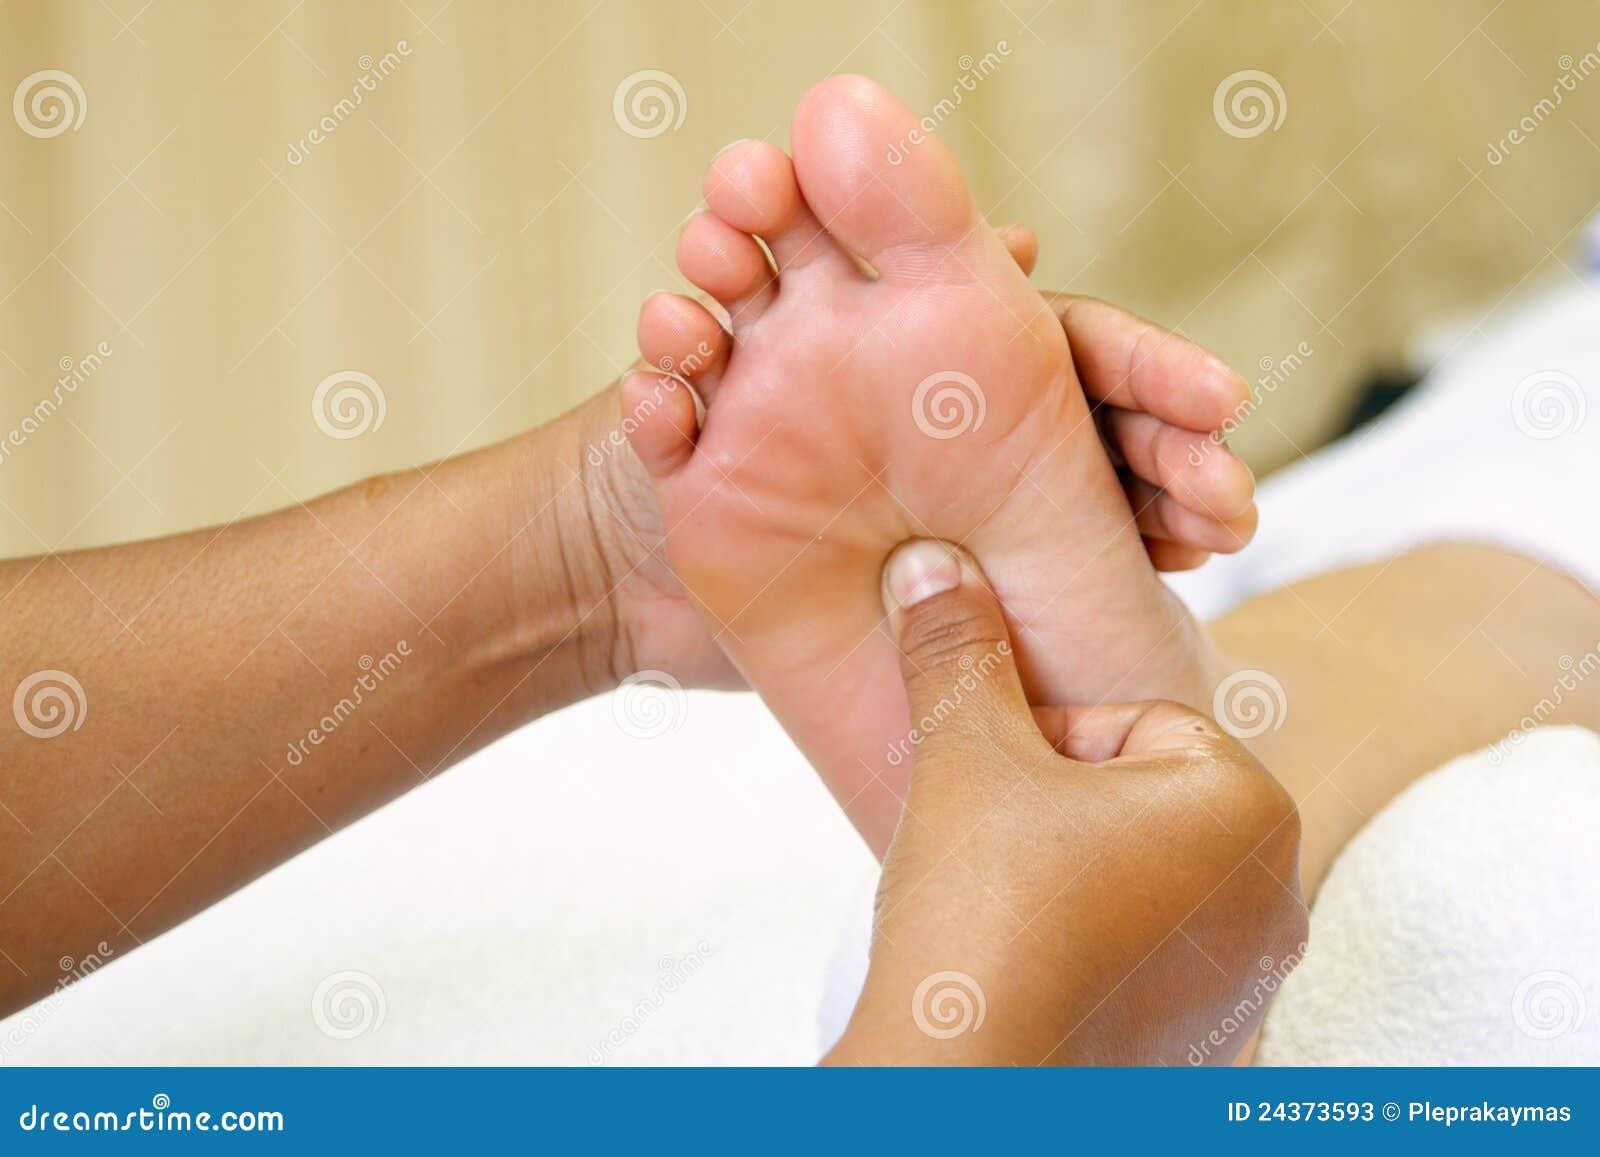 All fantasy asian foot massage pain